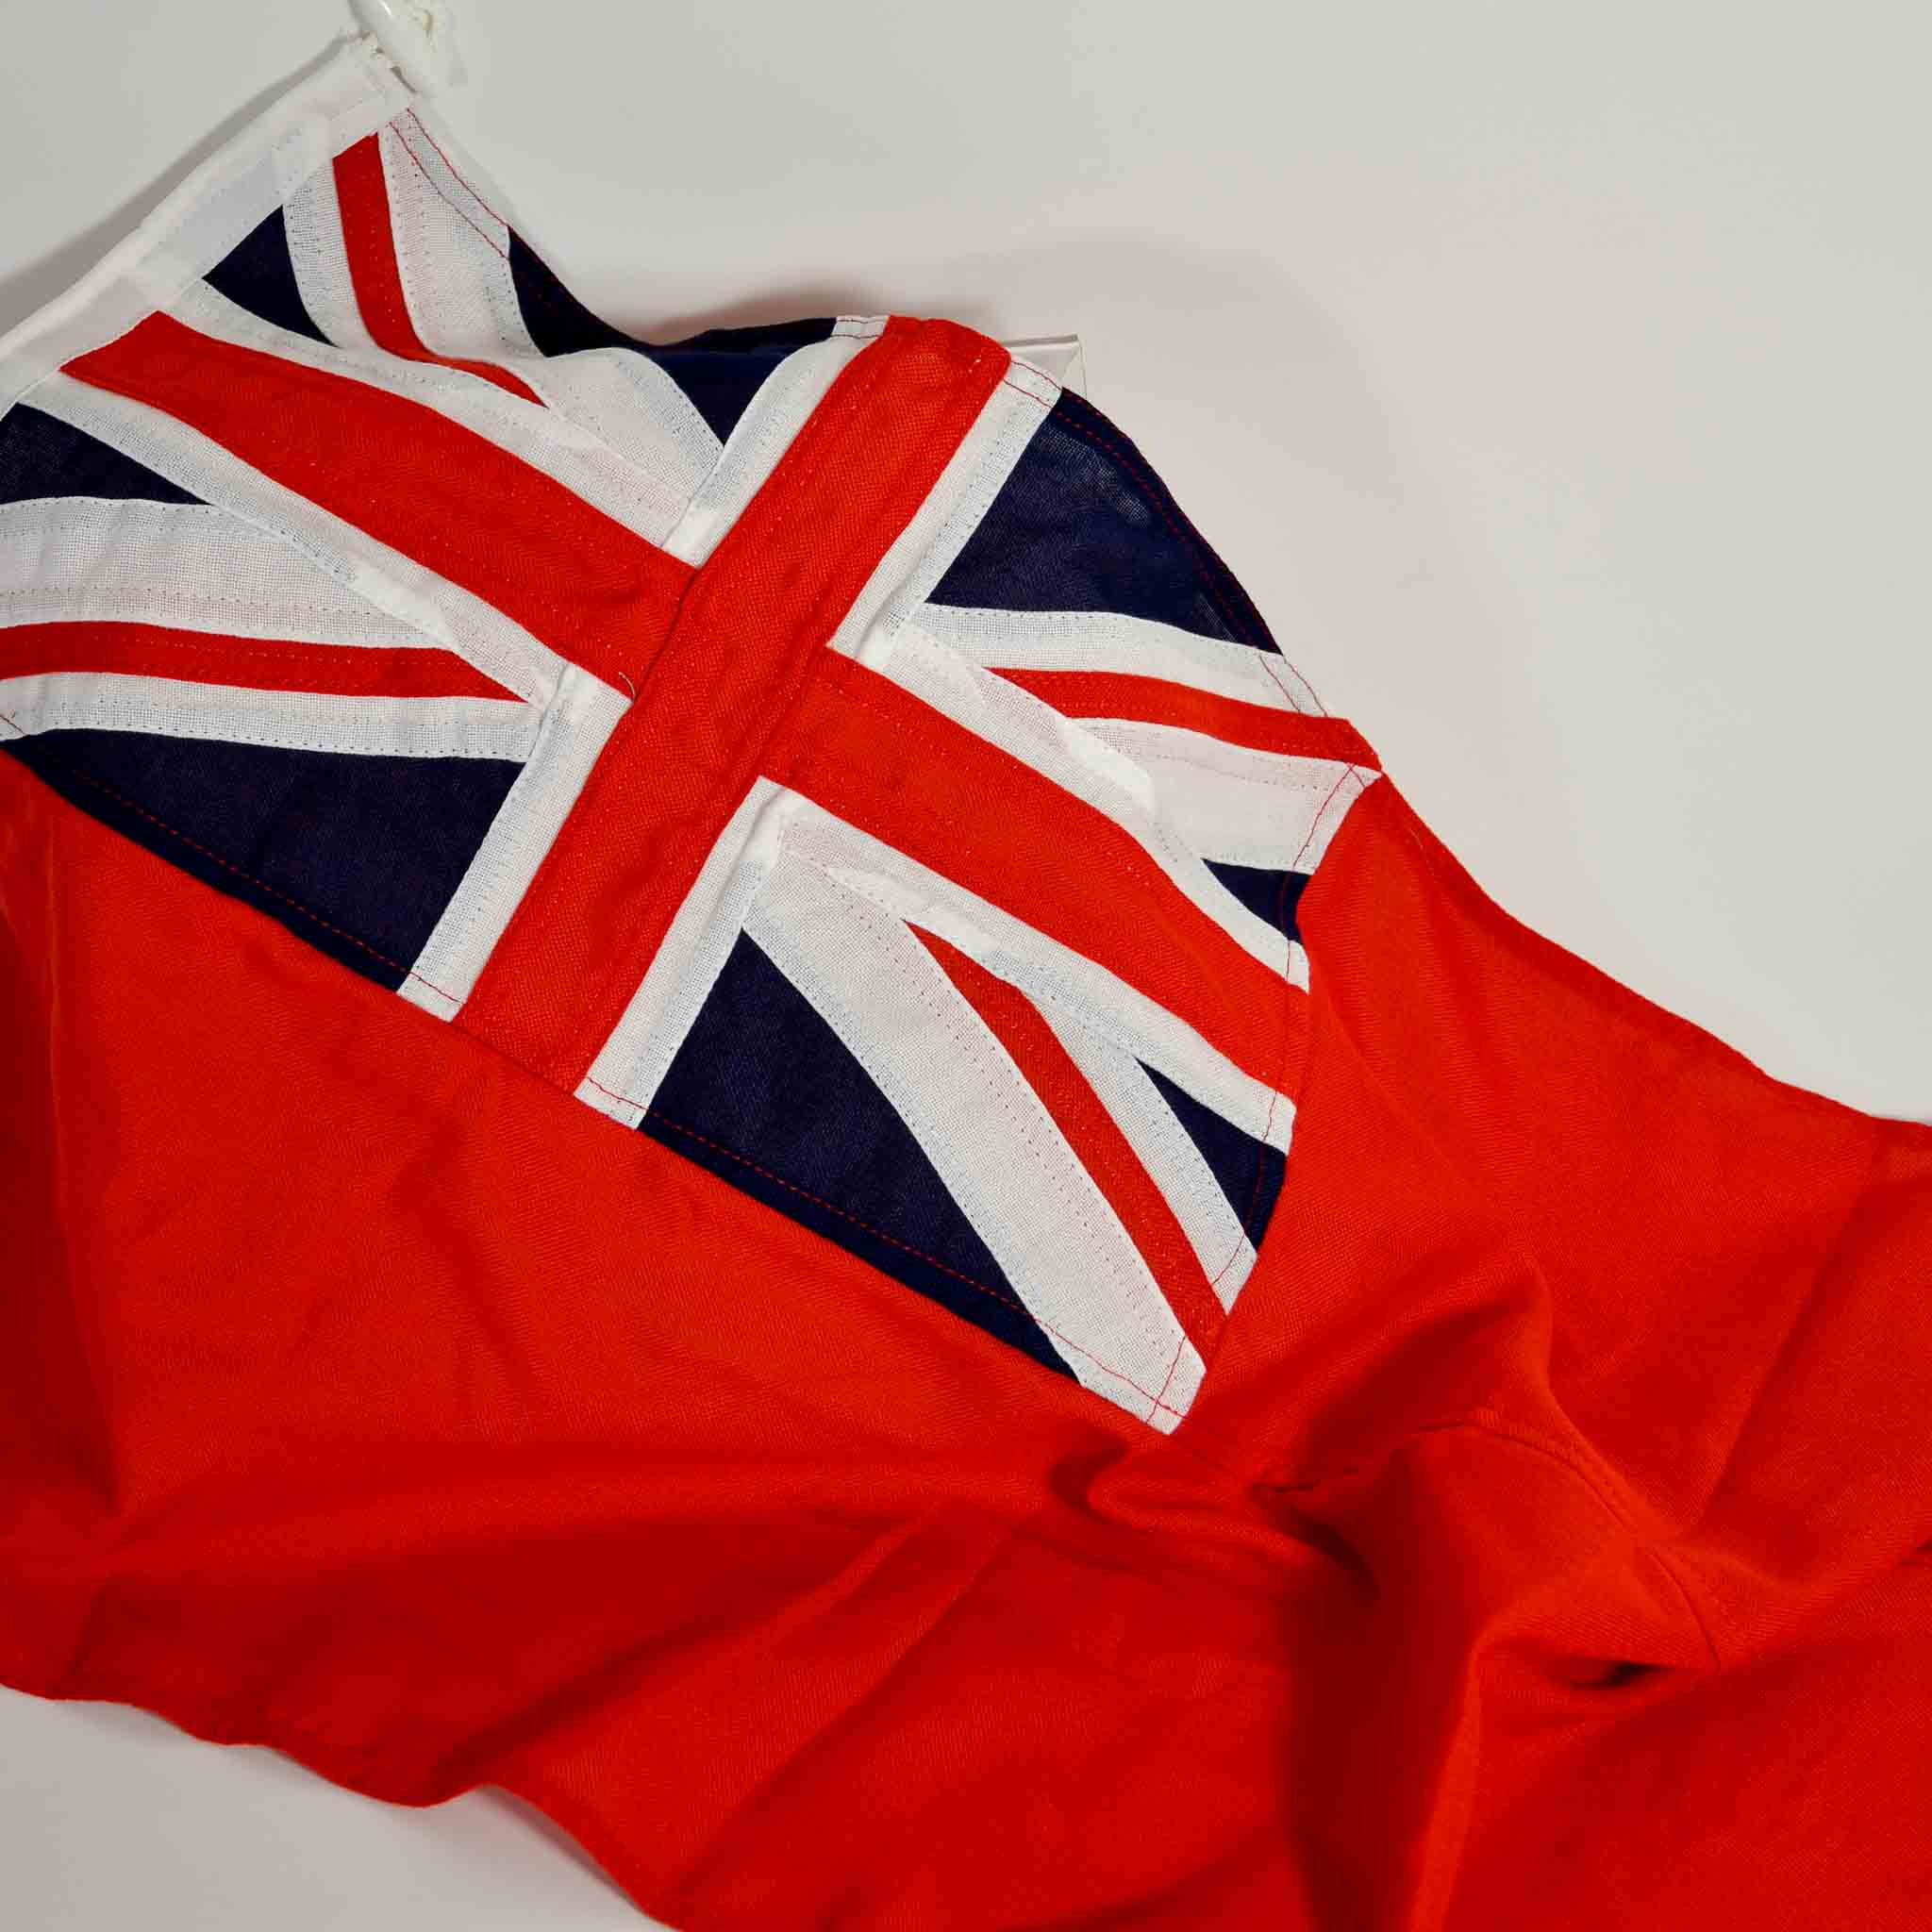 High Quality Red Ensign Sewn Boat Flag 3//4 Yard 40cm x 68.5cm